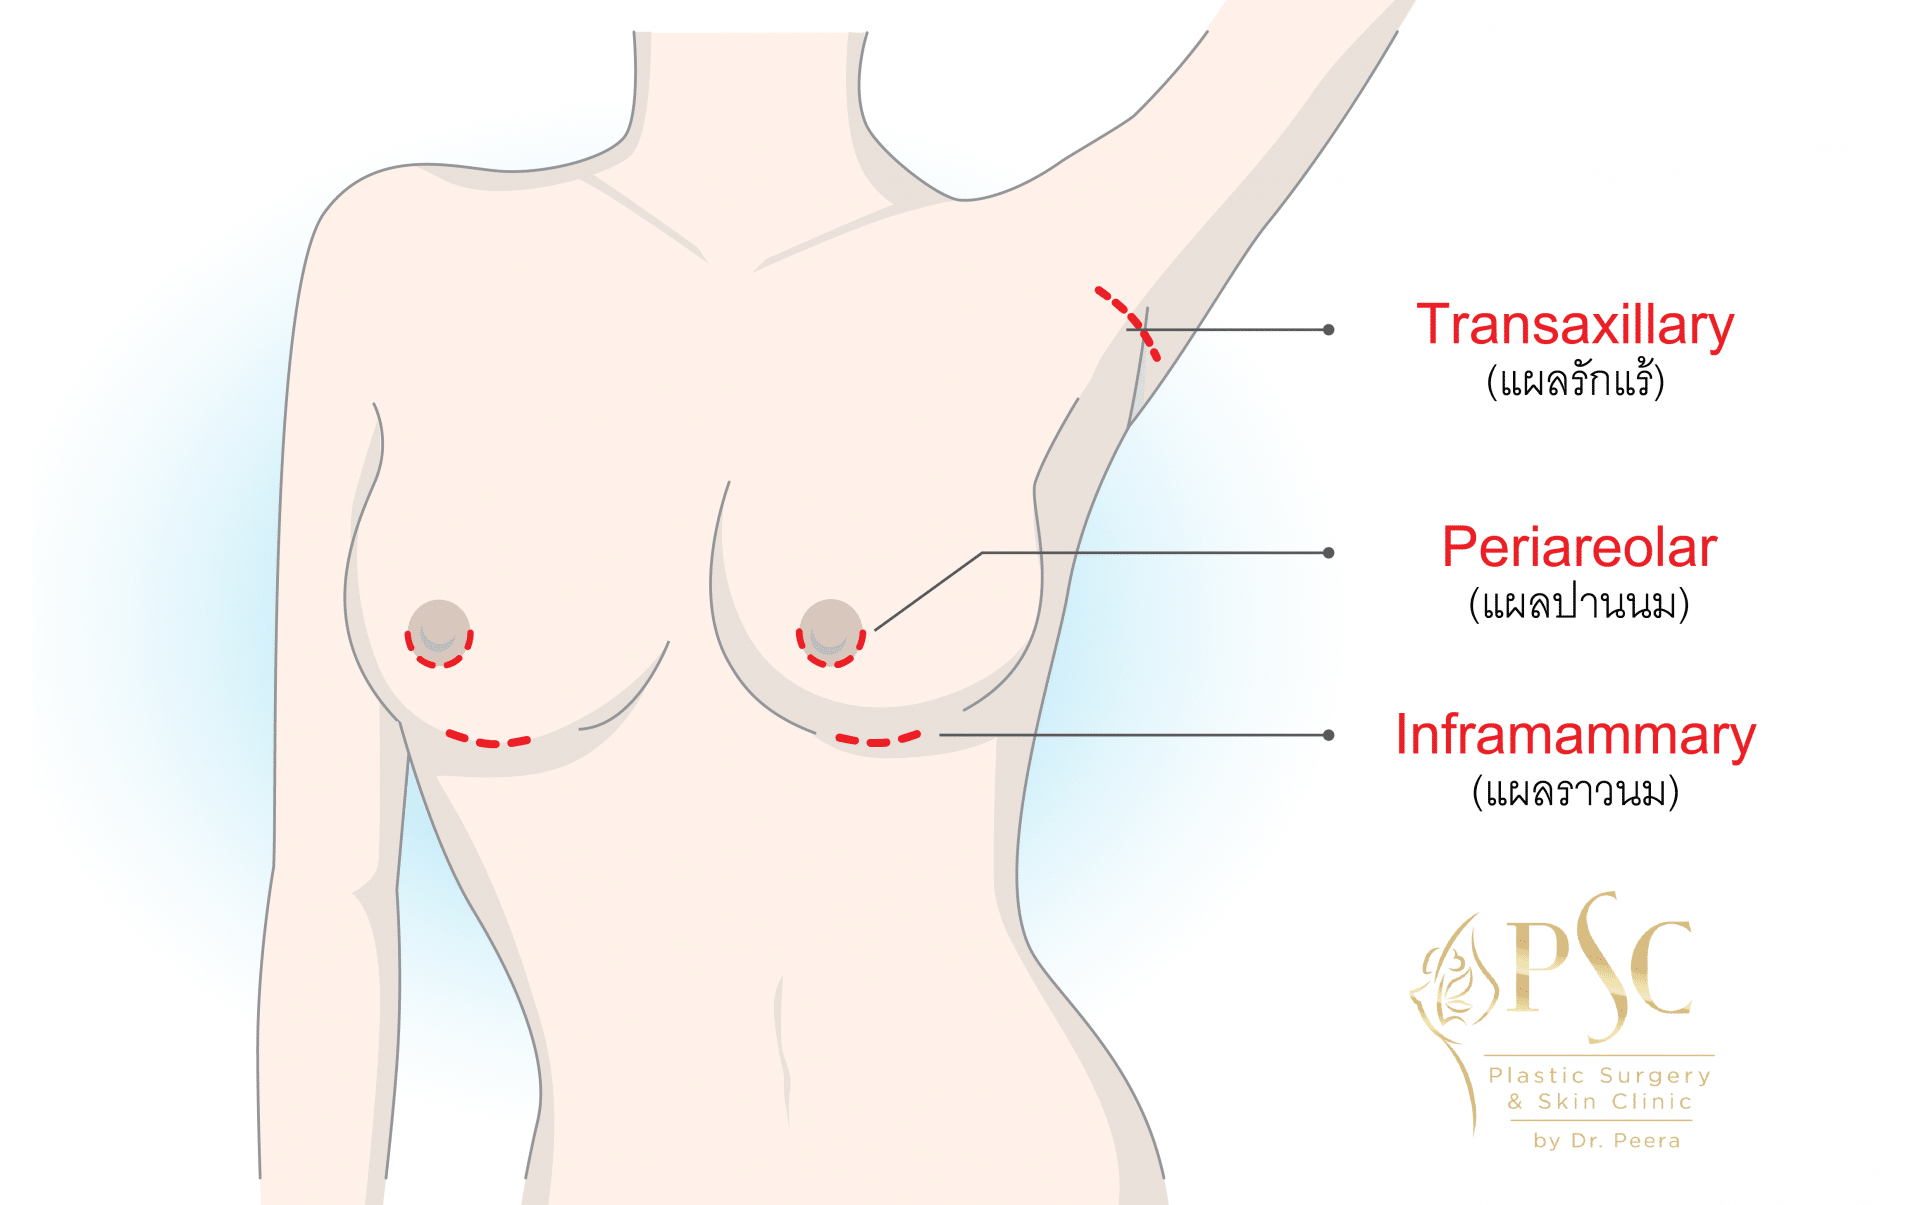 Sugery Breast 03 - คลินิกเสริมหน้าอก โดยหมอพีระ PSC Clinic ศัลยกรรมหน้าอก เสริมนม Breast Augmentation